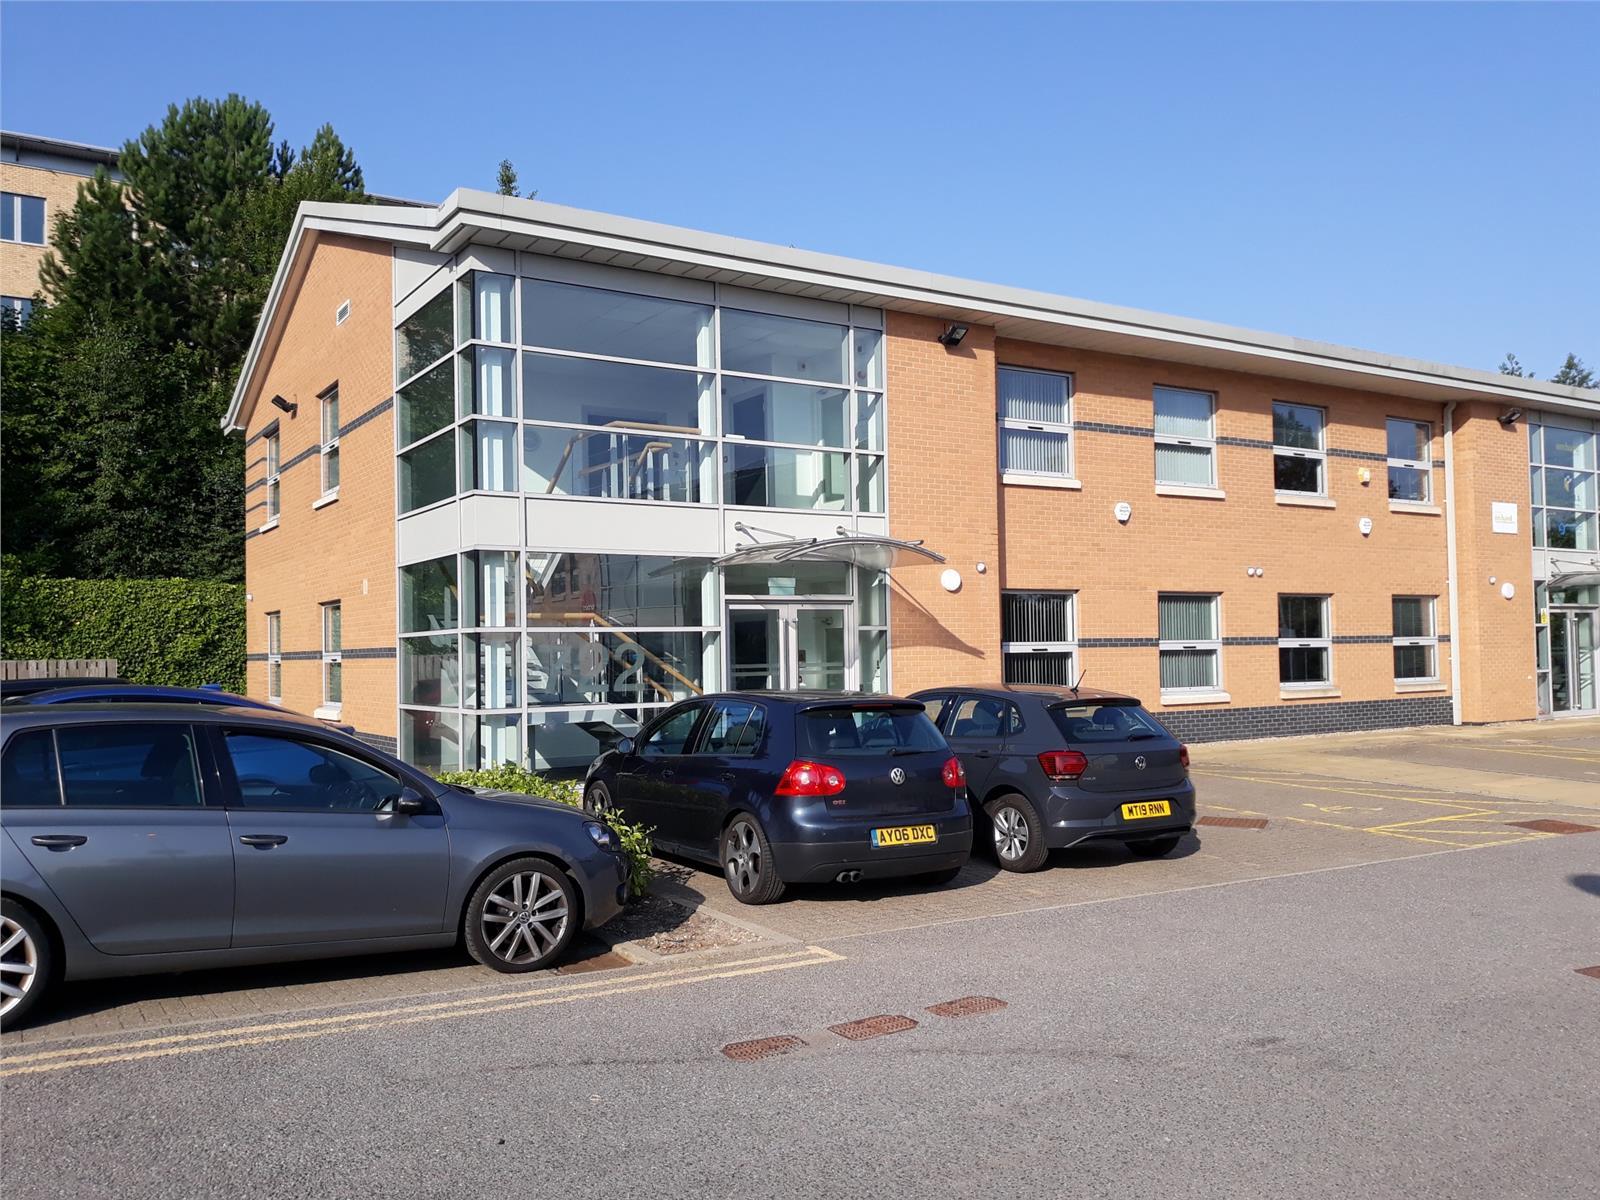 722 Capability Green Business Park, Luton, LU1 3LU